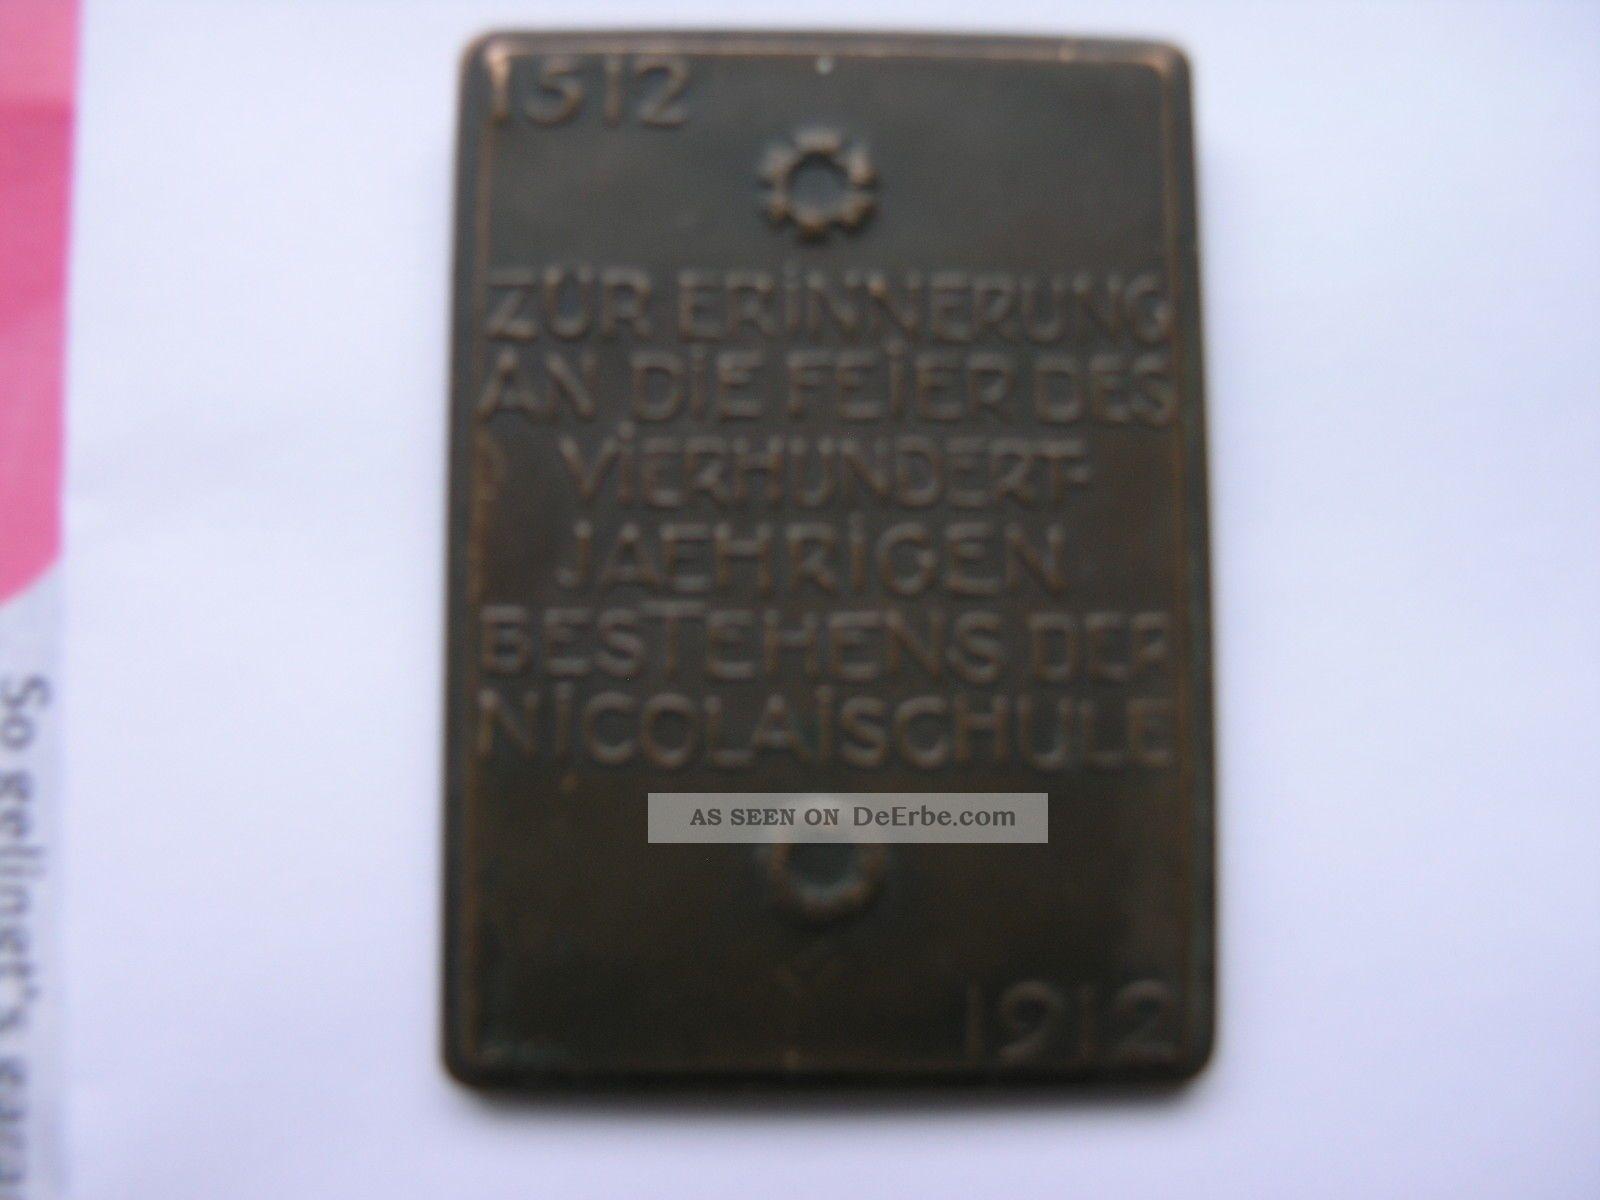 antike bronze plakette leipzig 1912 400 jahre nikolaischule. Black Bedroom Furniture Sets. Home Design Ideas